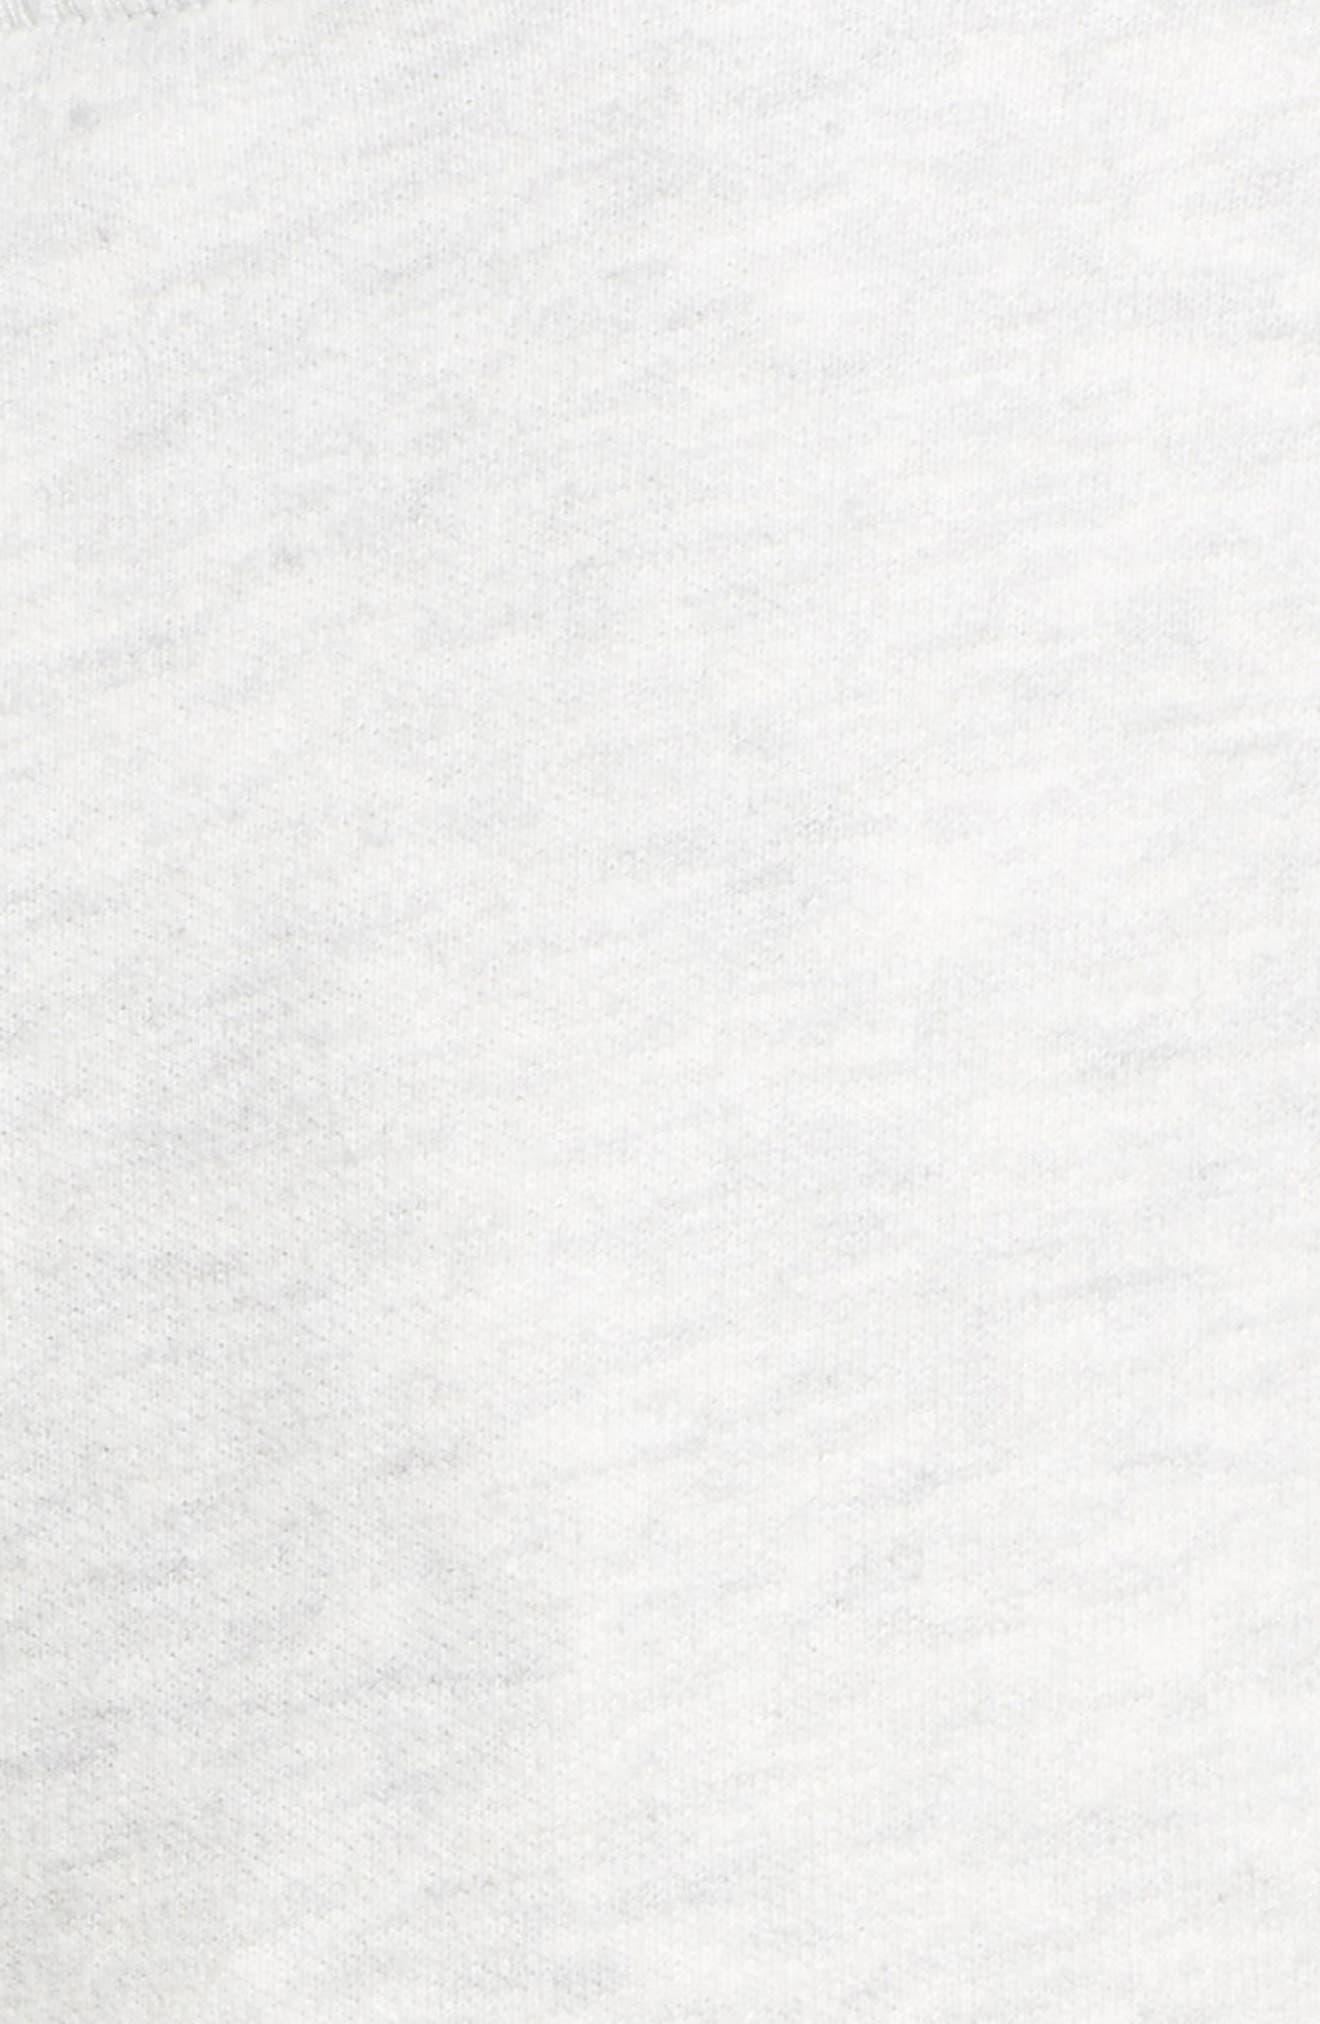 Slim Fit Sweatpants,                             Alternate thumbnail 5, color,                             072